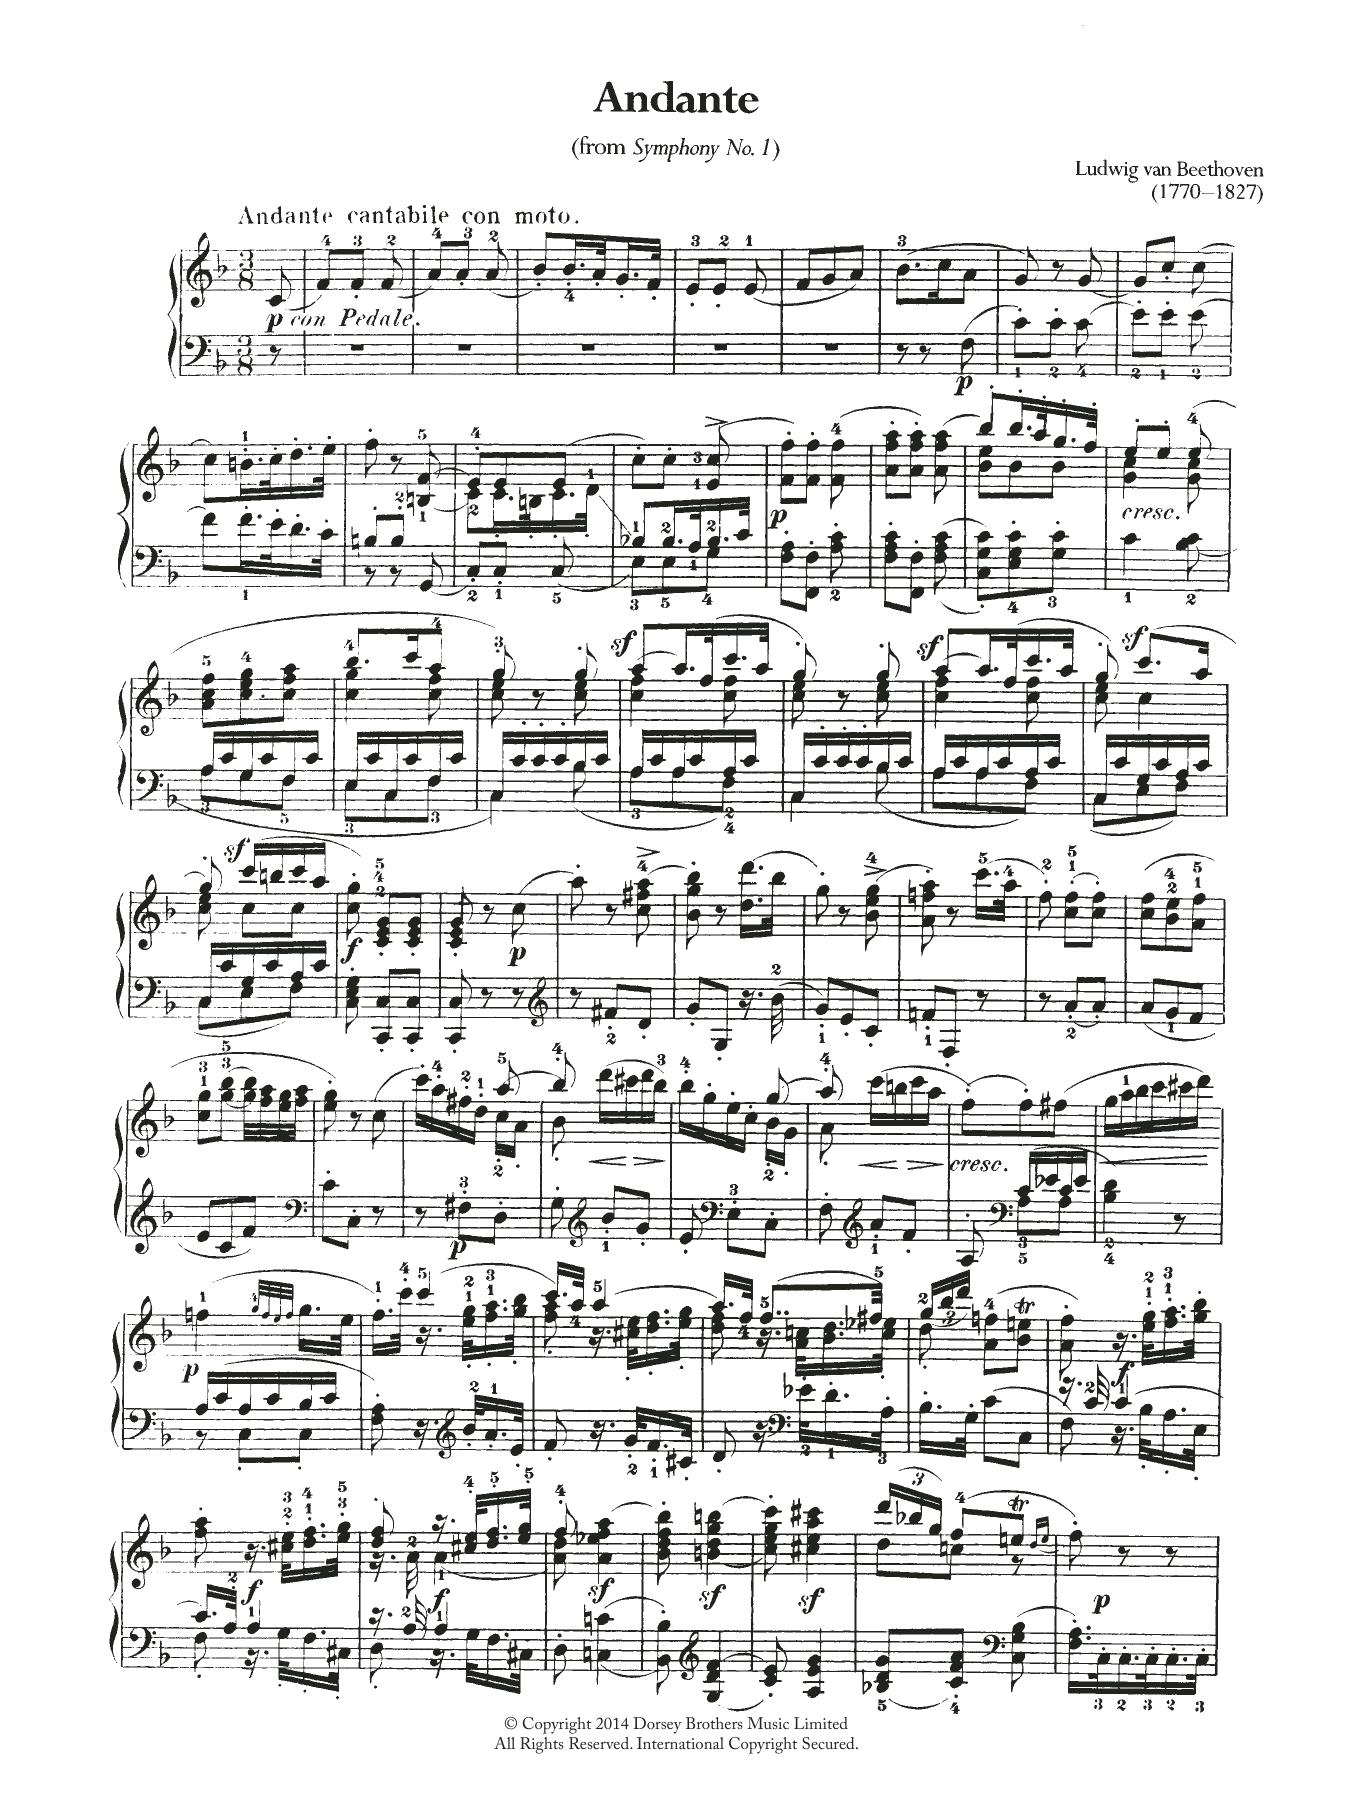 Ludwig van Beethoven - Symphony No.1, Andante